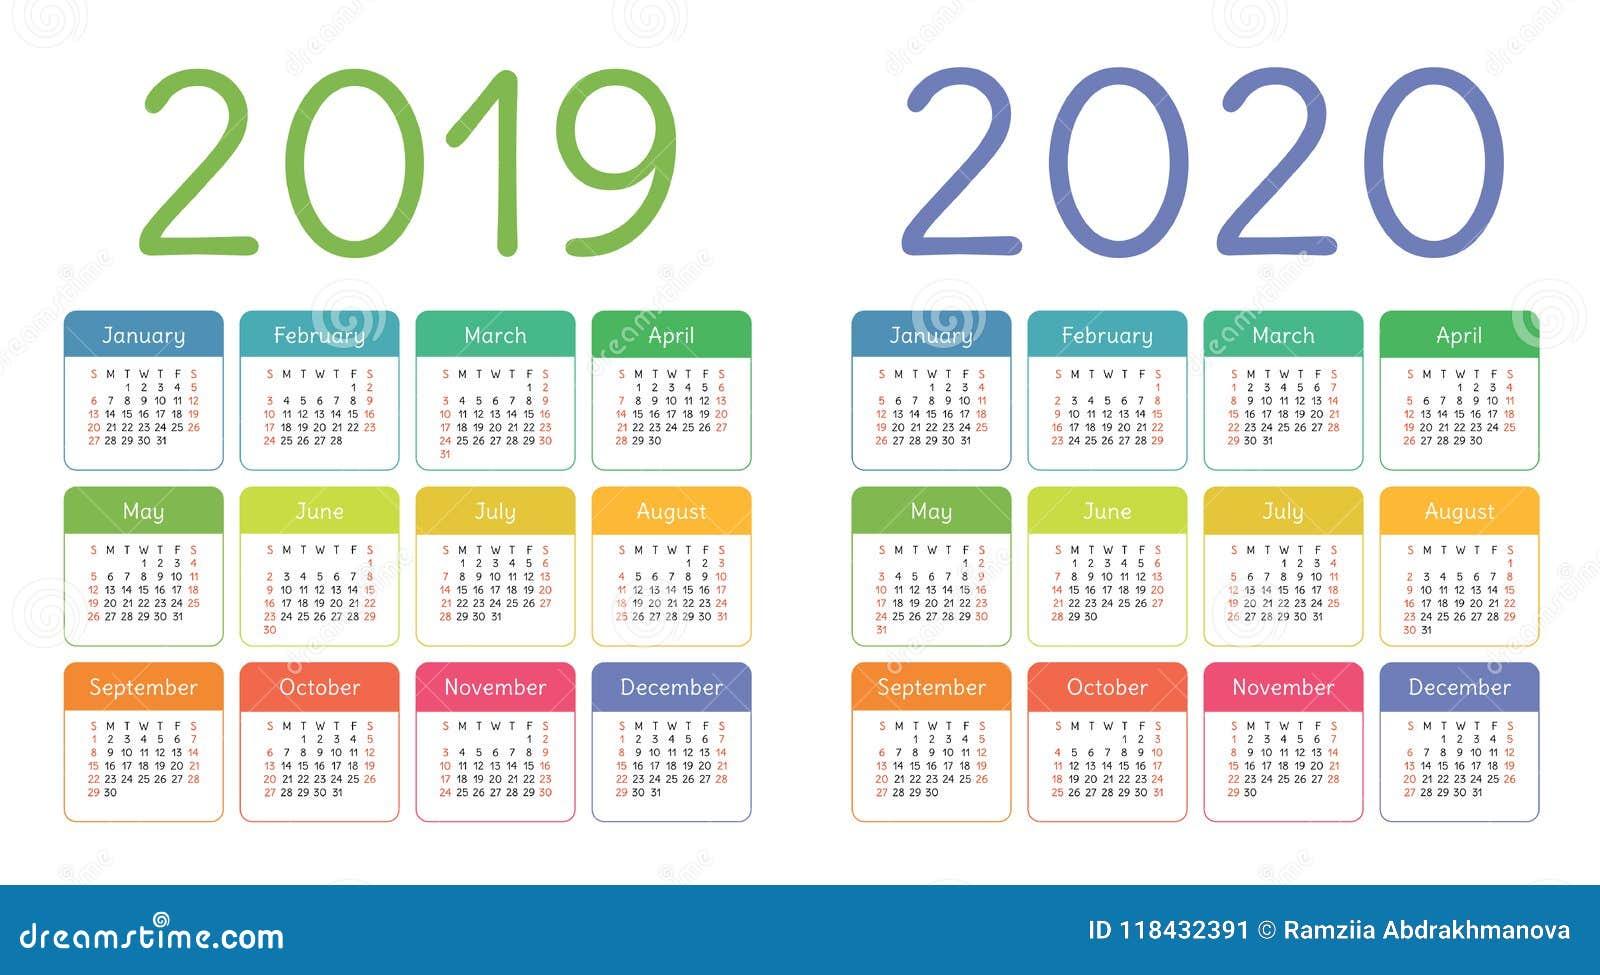 Settimane Calendario 2020.Calendario 2019 2020 Anni Insieme Variopinto Del Calendario